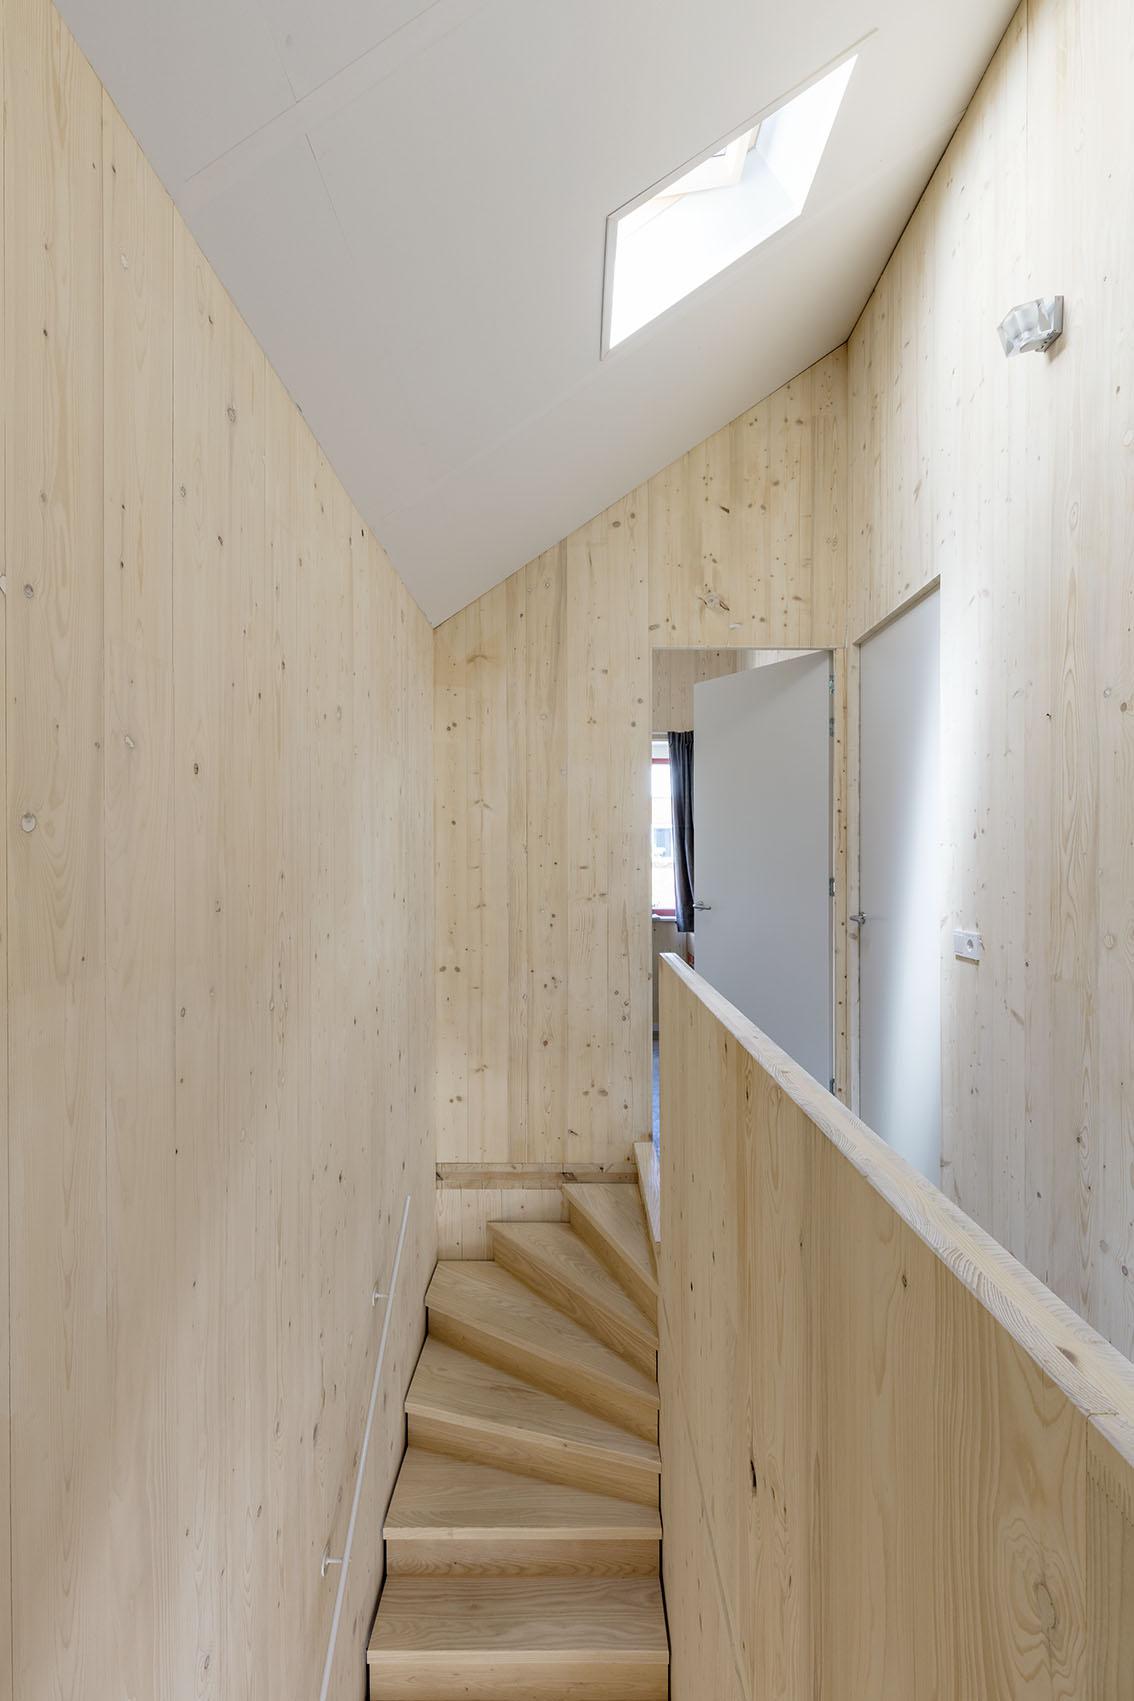 <p>Kavel 19 &#8211; overloop op 2e verdieping  foto: Marcel van der Burg</p>